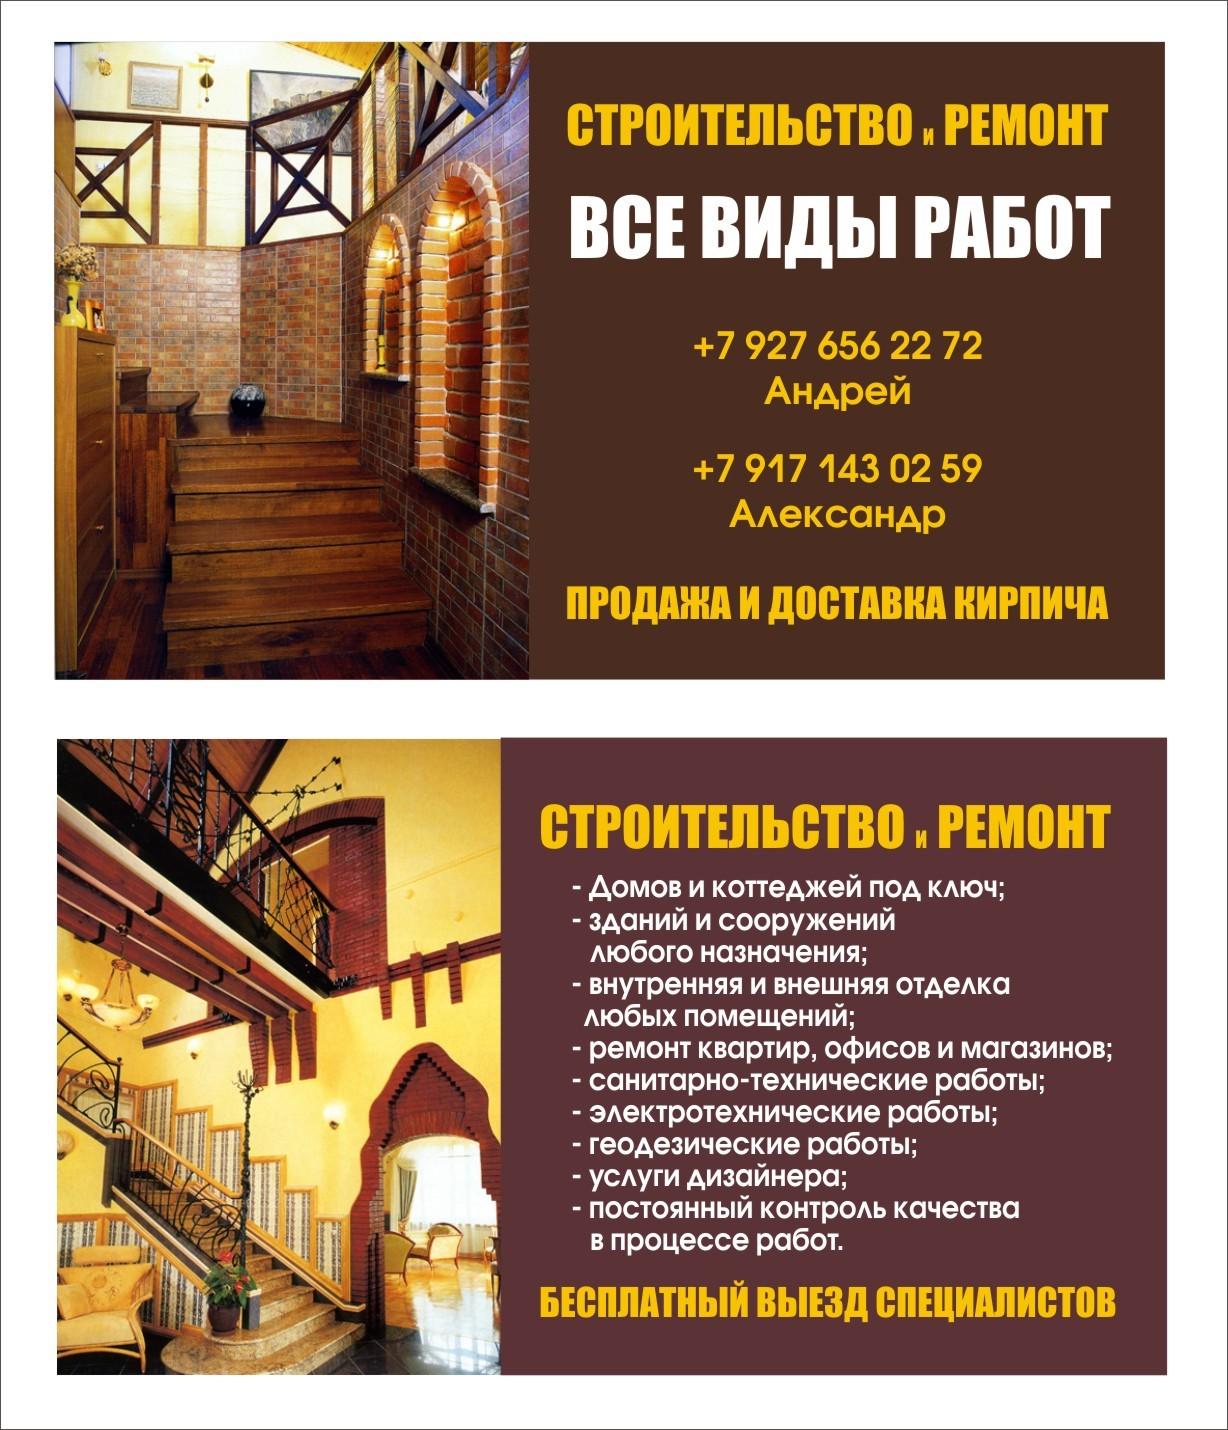 Визитки для ремонта квартир в Москве | фото 1